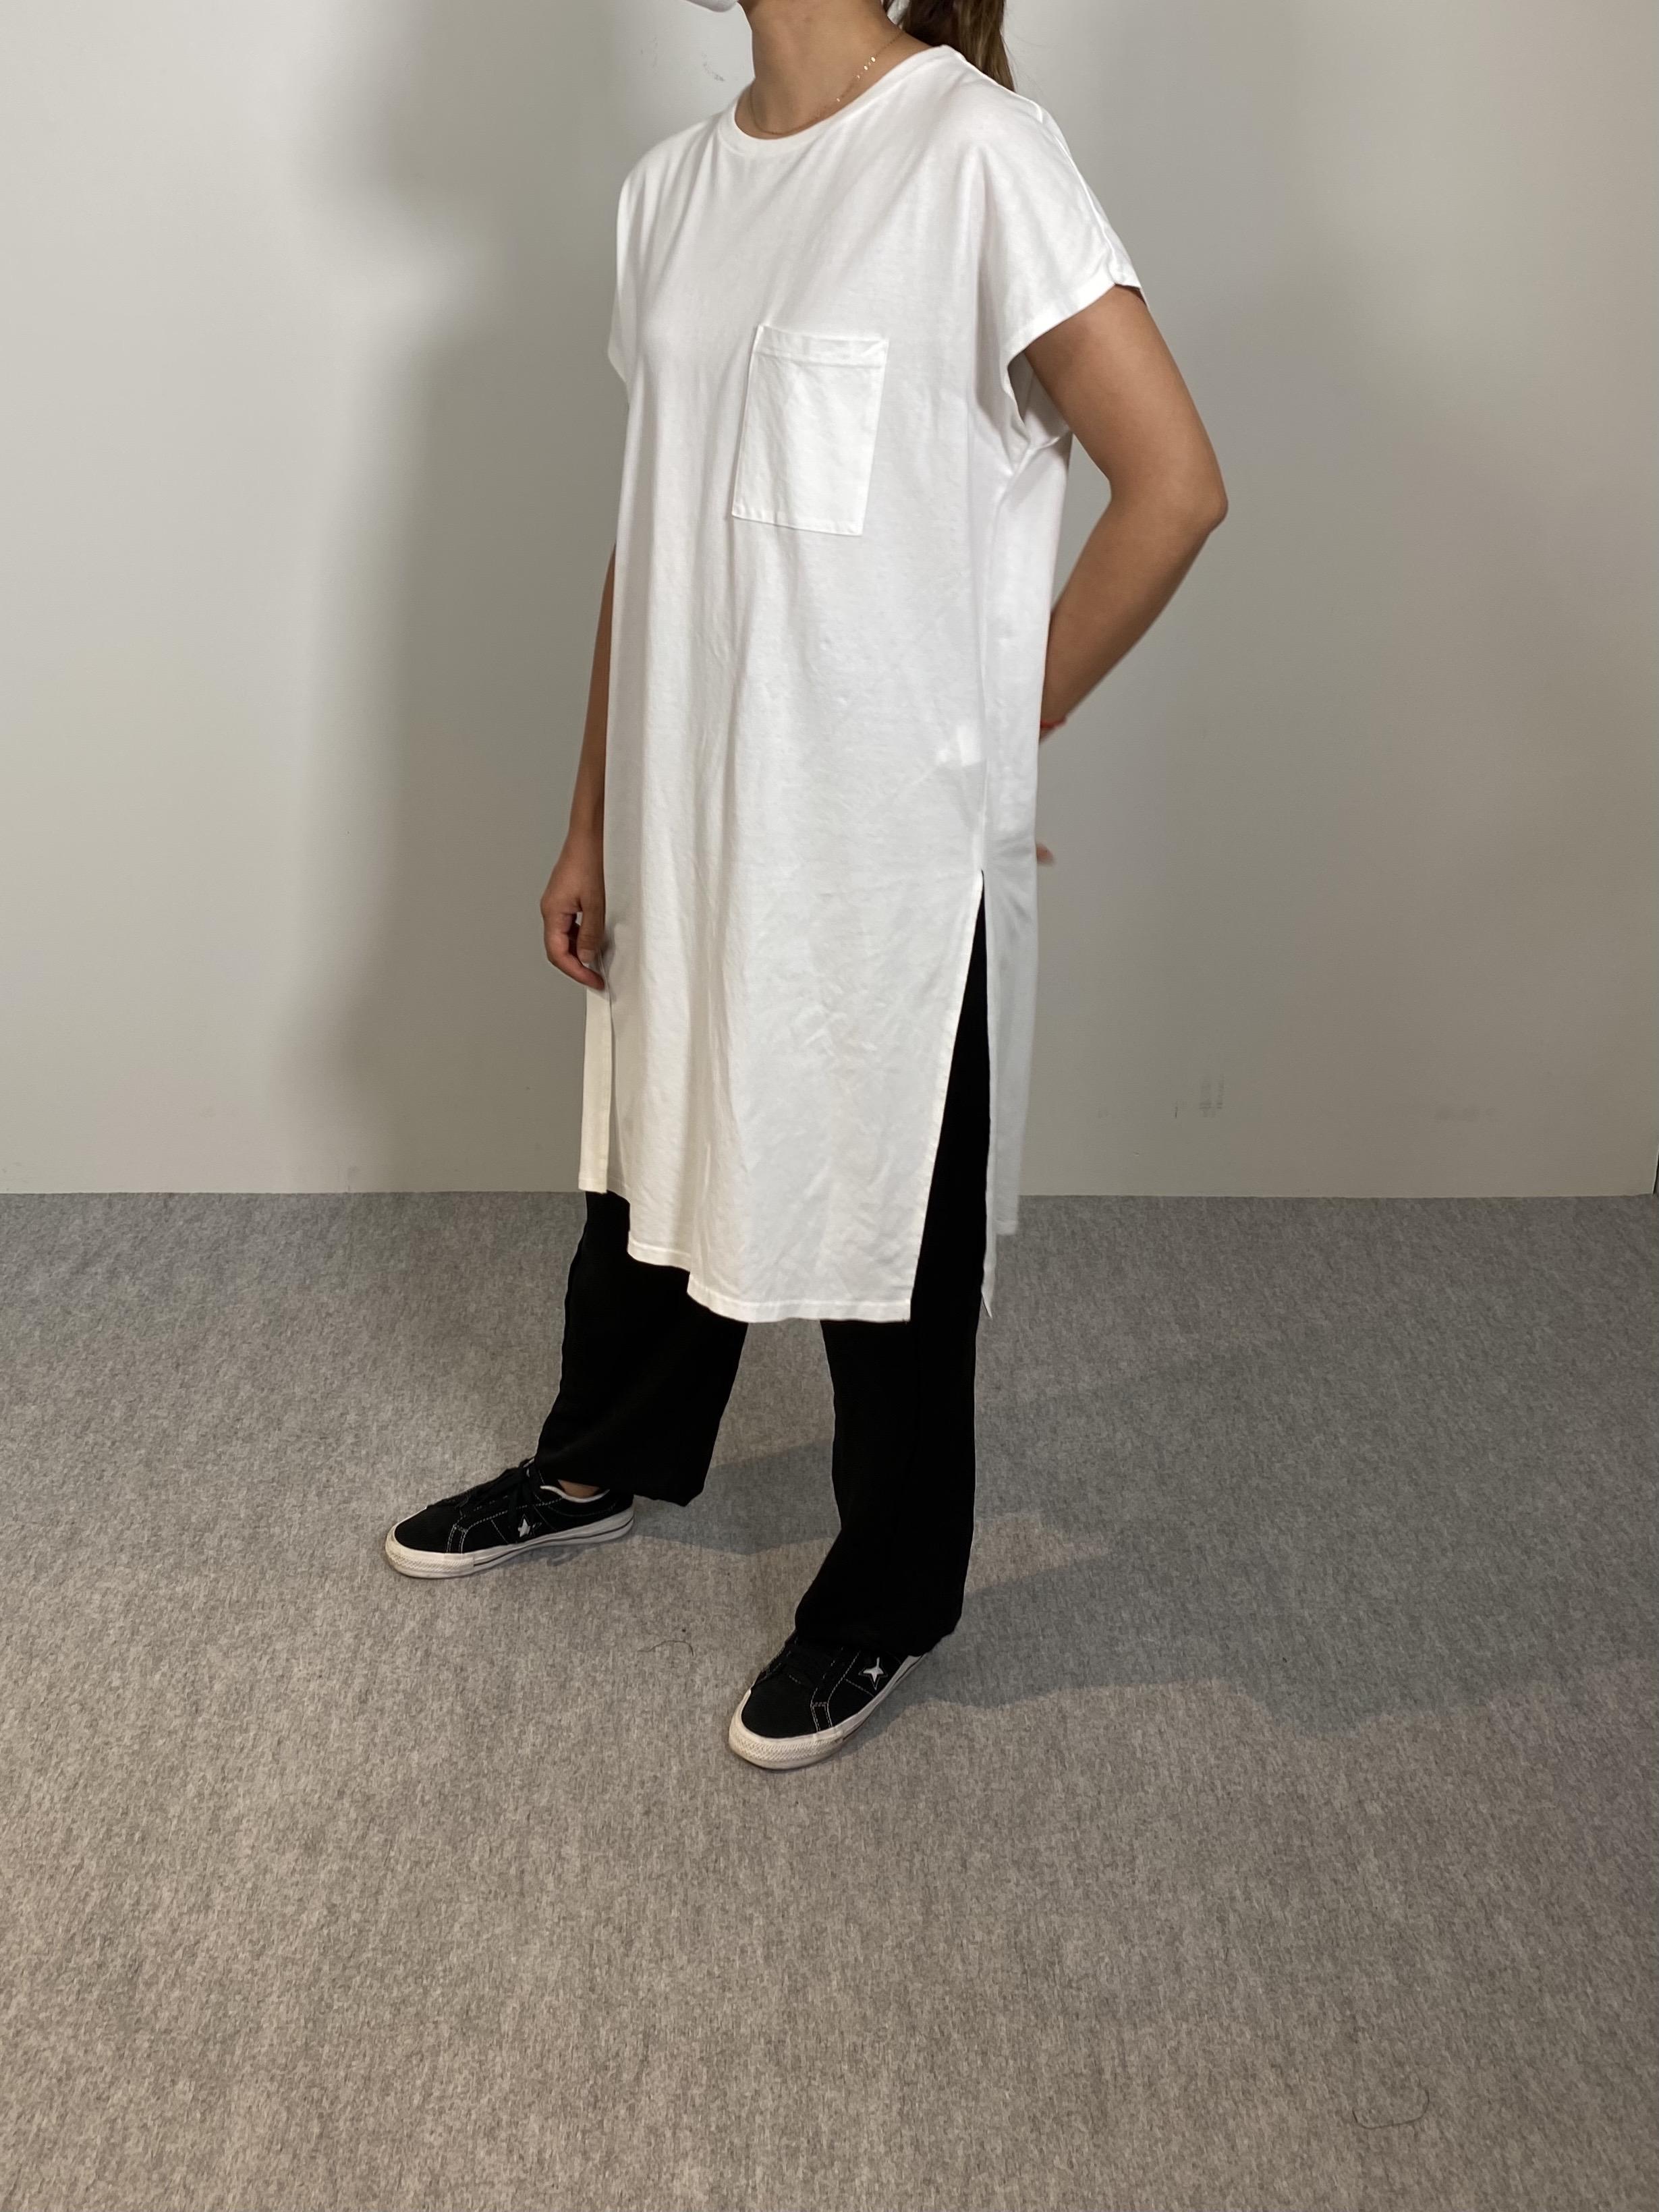 Women's COMFORT DRESS TUNIC T-SHIRTの着用画像10